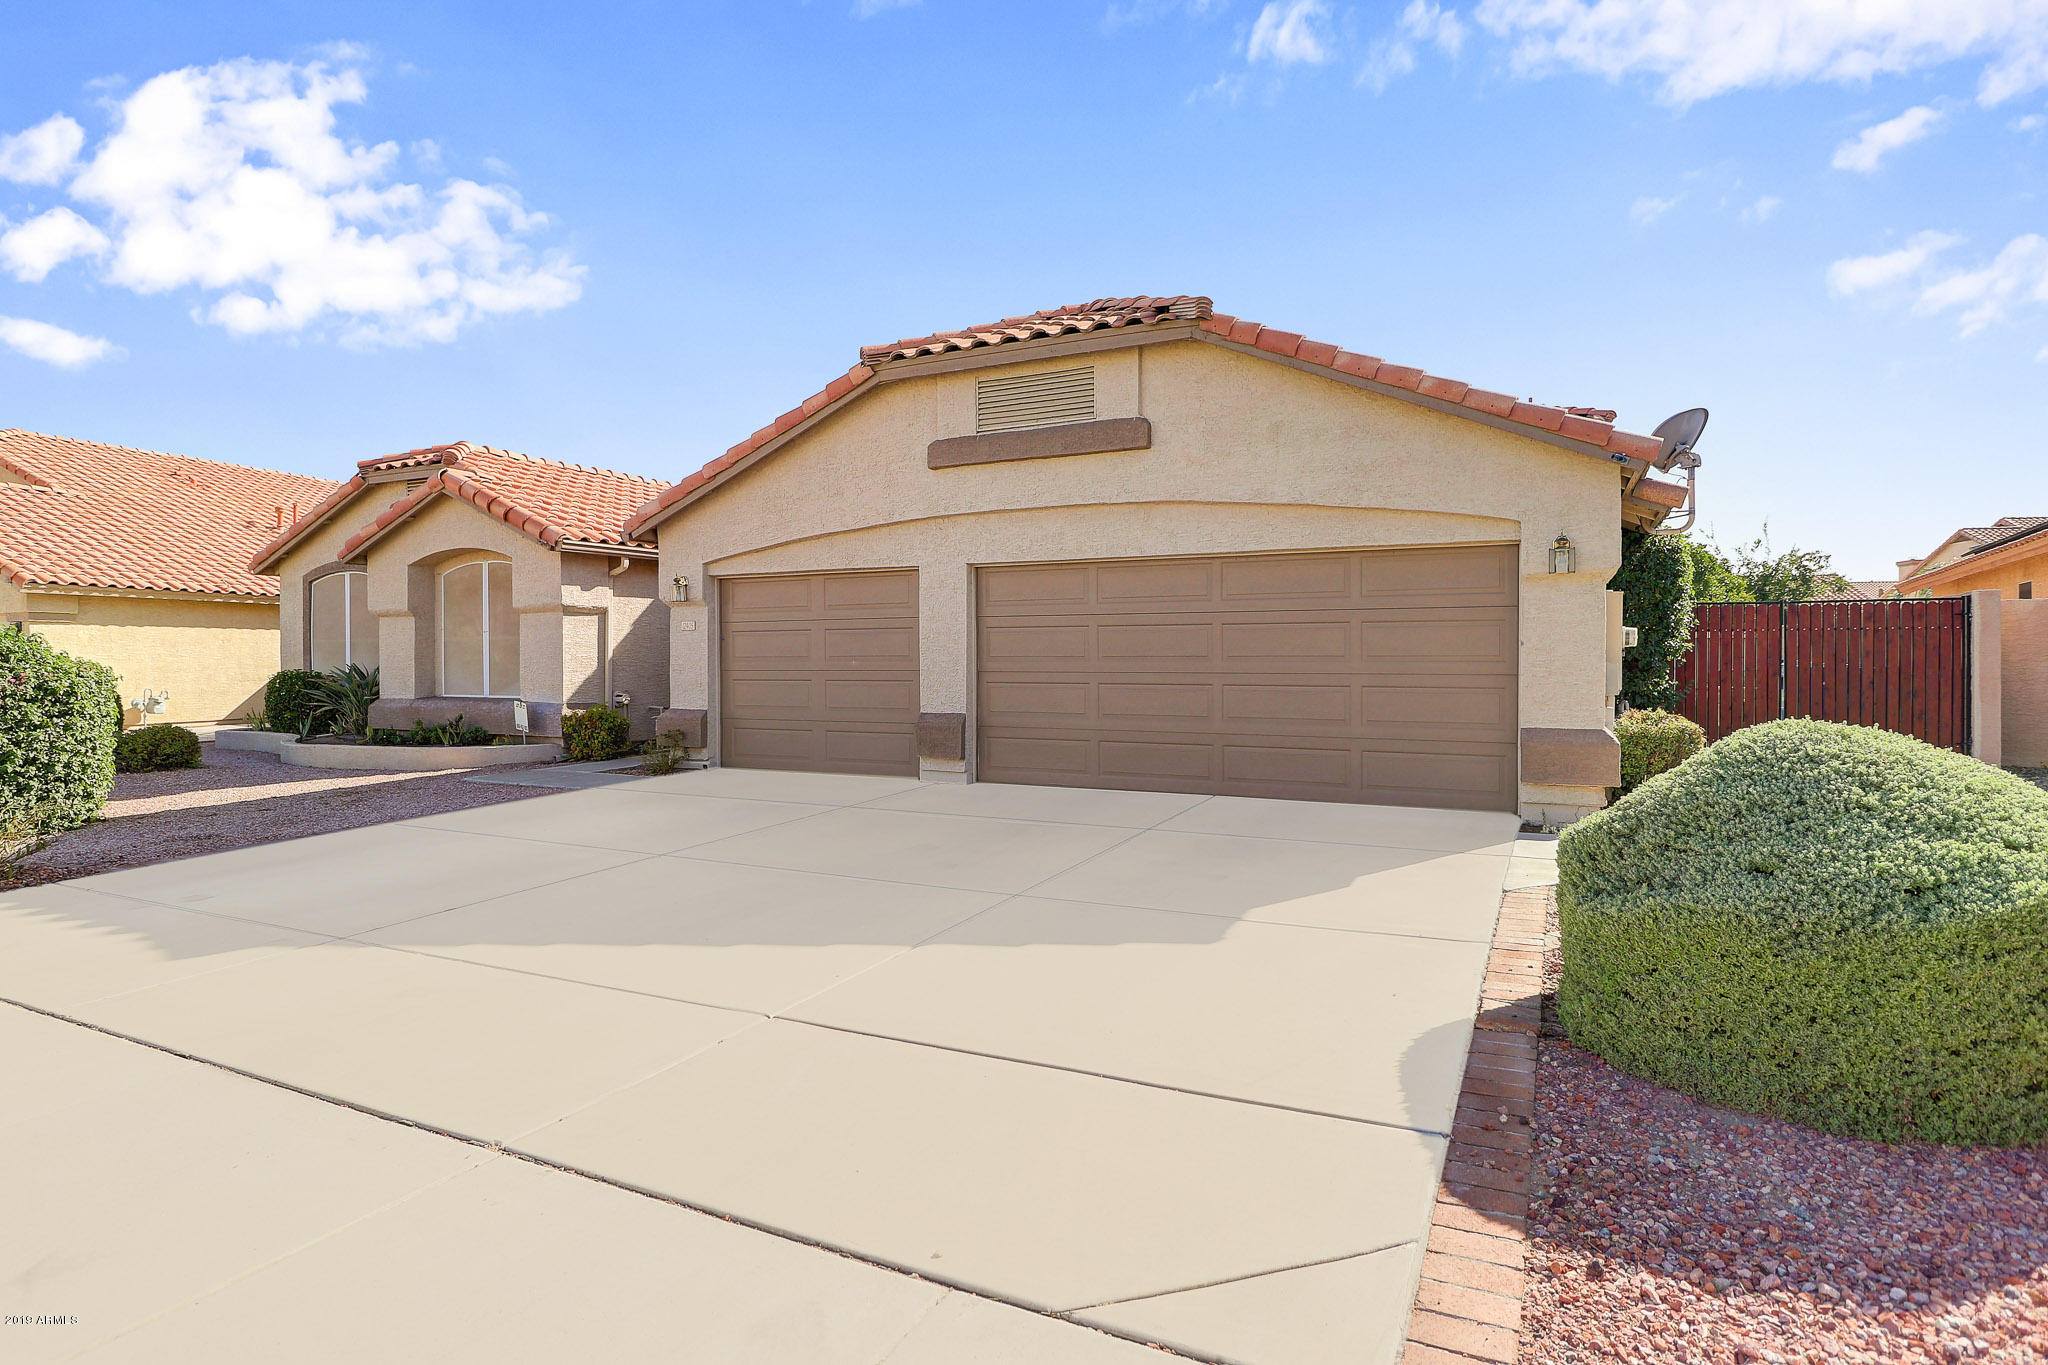 Photo of 12405 W LEWIS Avenue, Avondale, AZ 85392